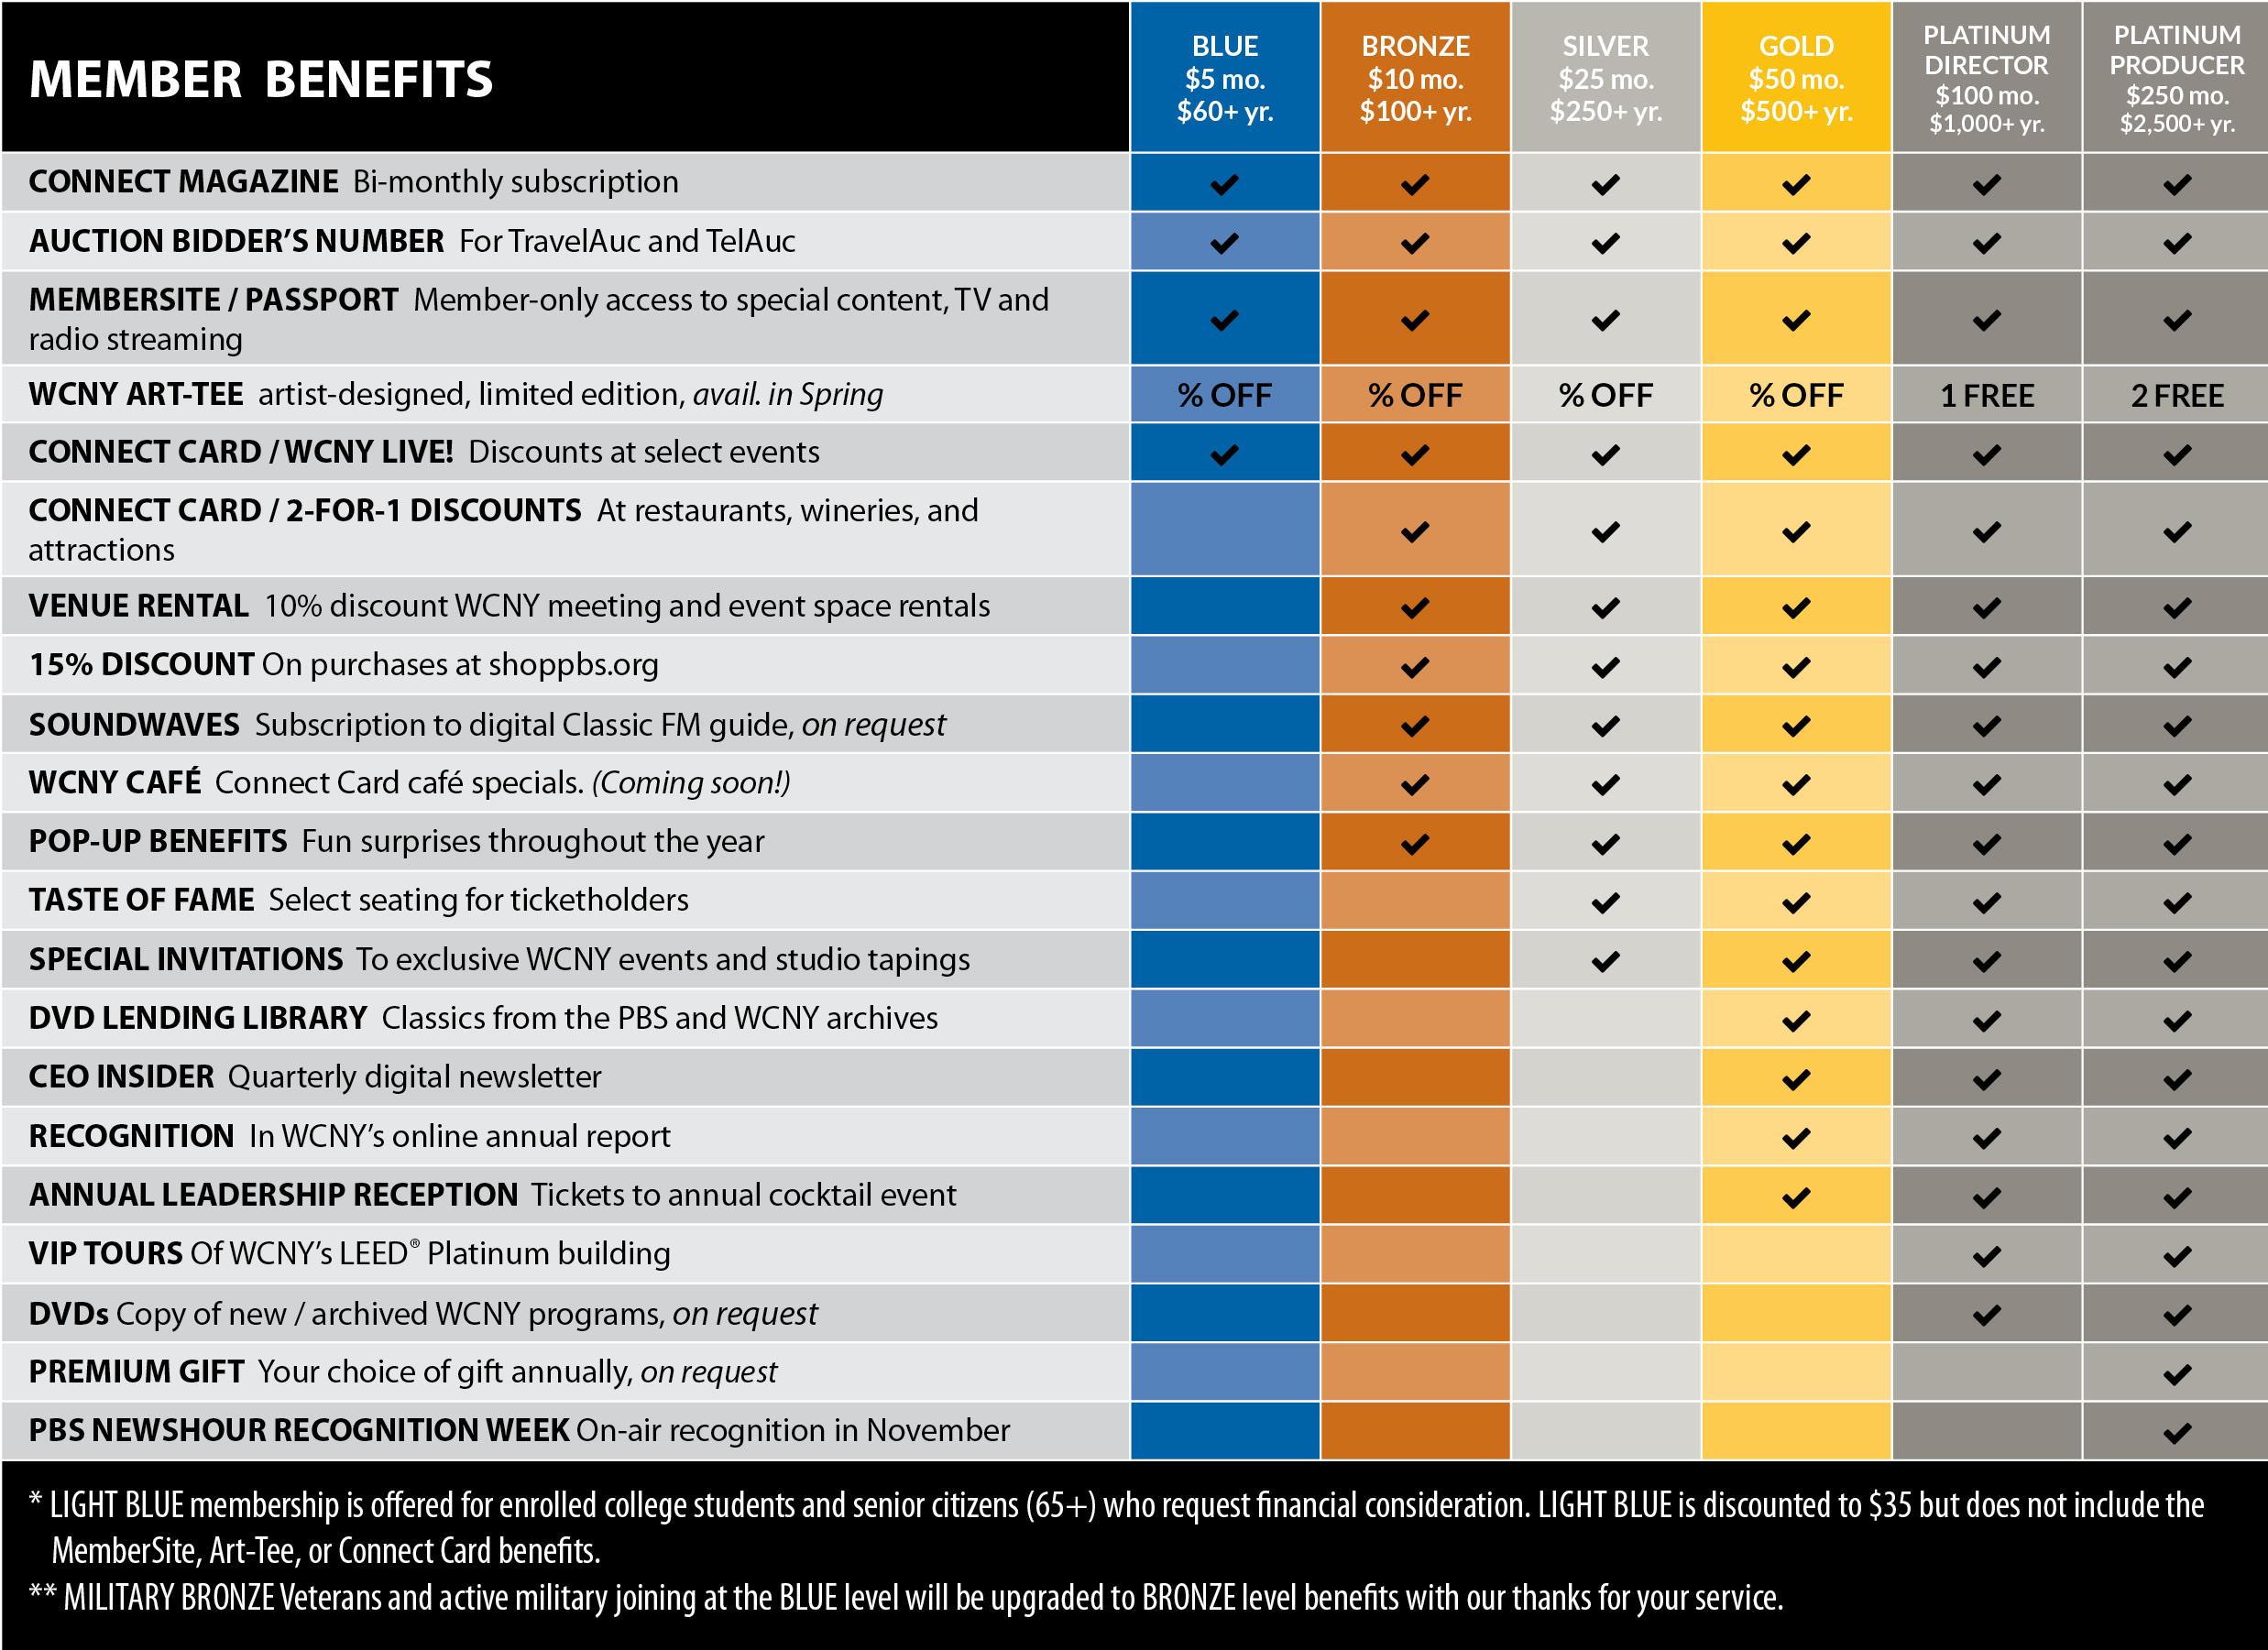 member-benefit-table-11-16-jpg